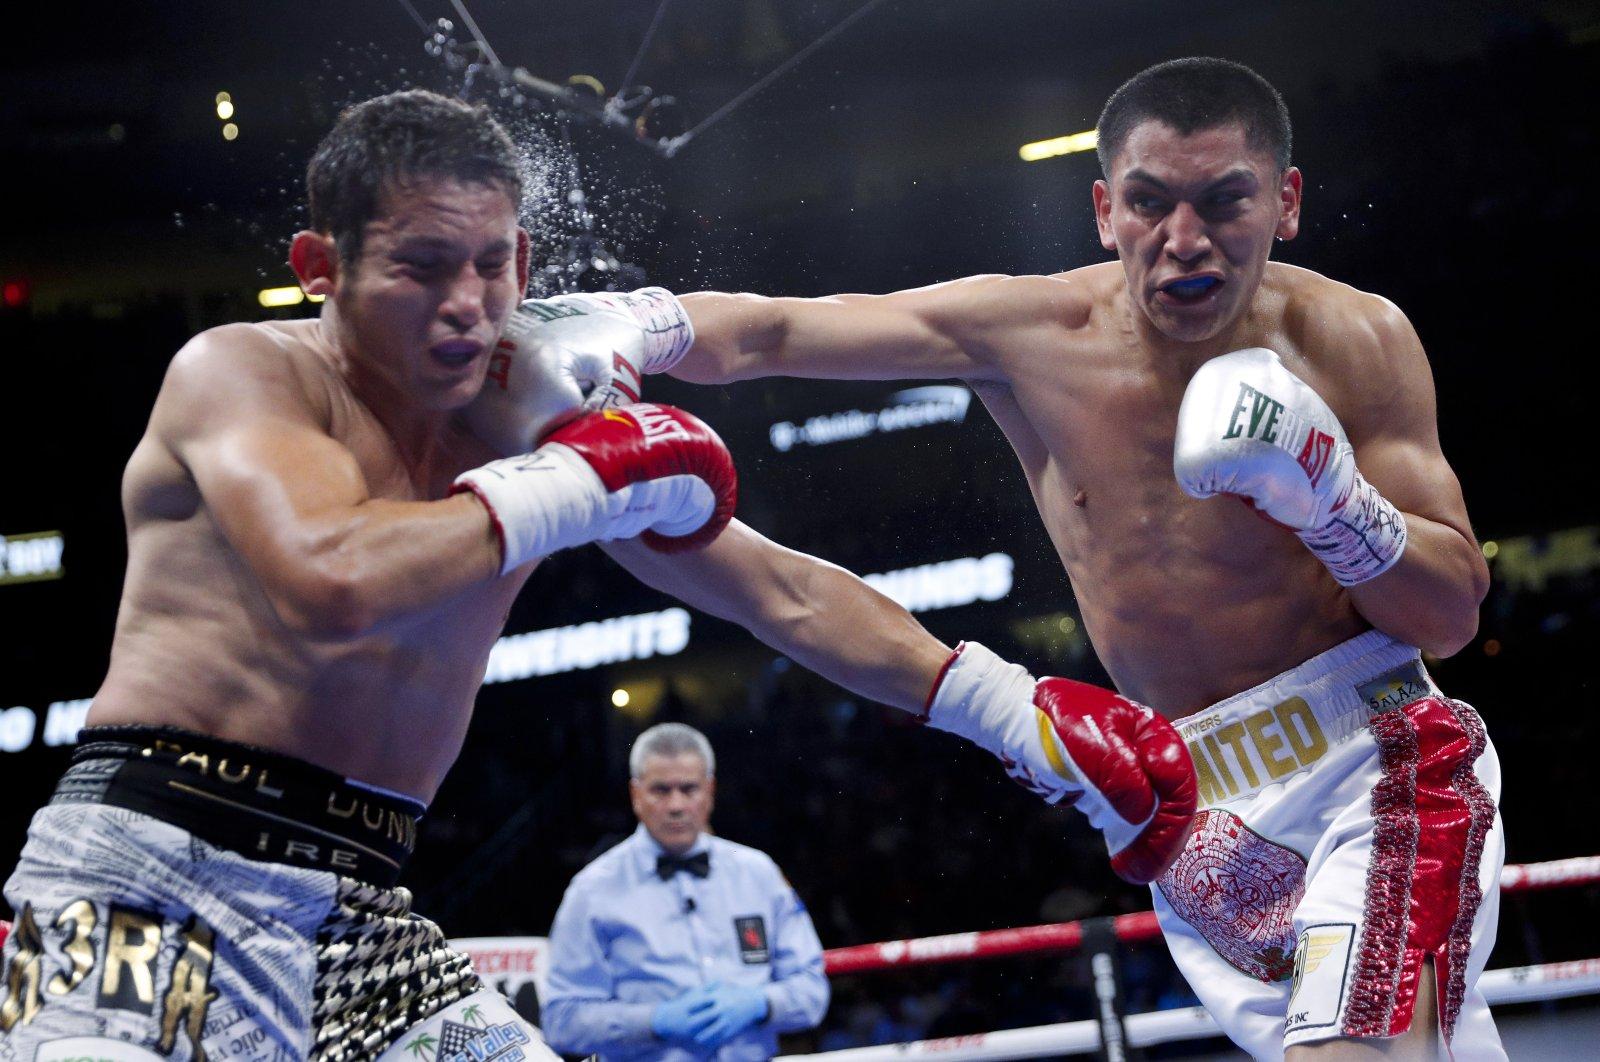 Vergil Ortiz Jr. (R) hits Mauricio Herrera during a welterweight boxing match in Las Vegas, U.S., May 4, 2019. (AP Photo)